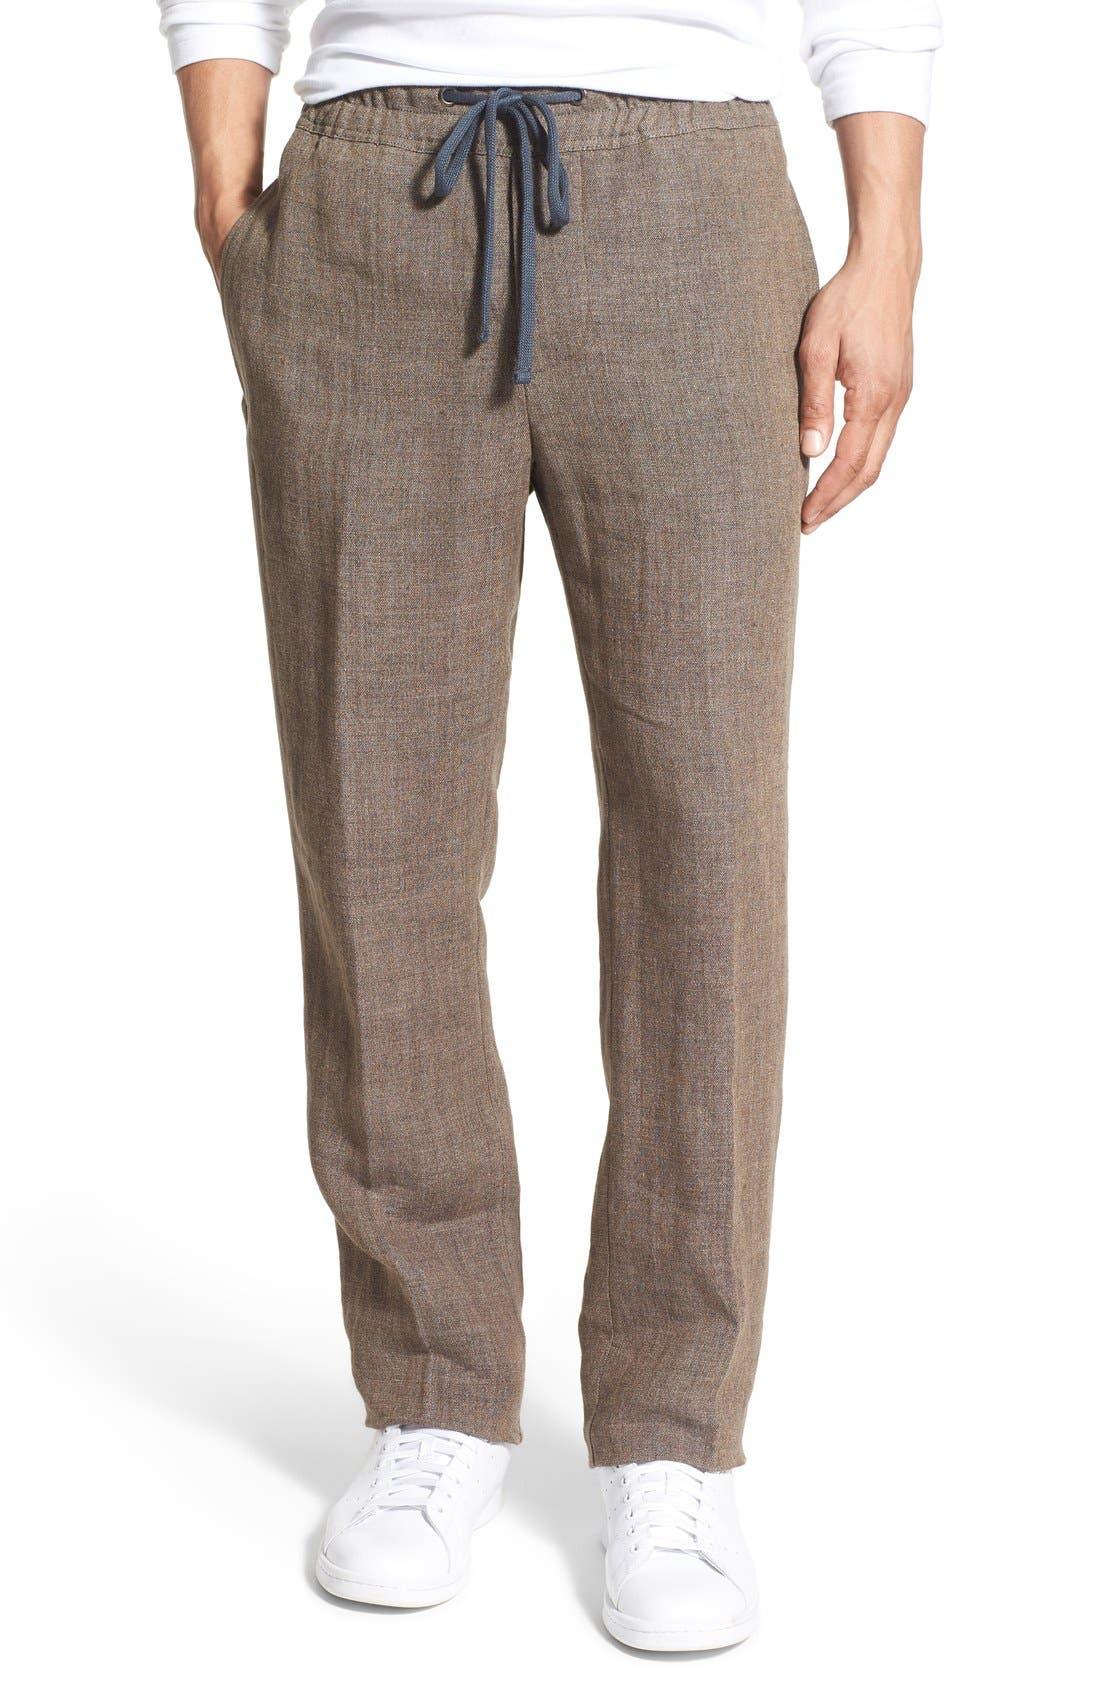 'Delave' Drawstring Linen Pants,                             Main thumbnail 1, color,                             207